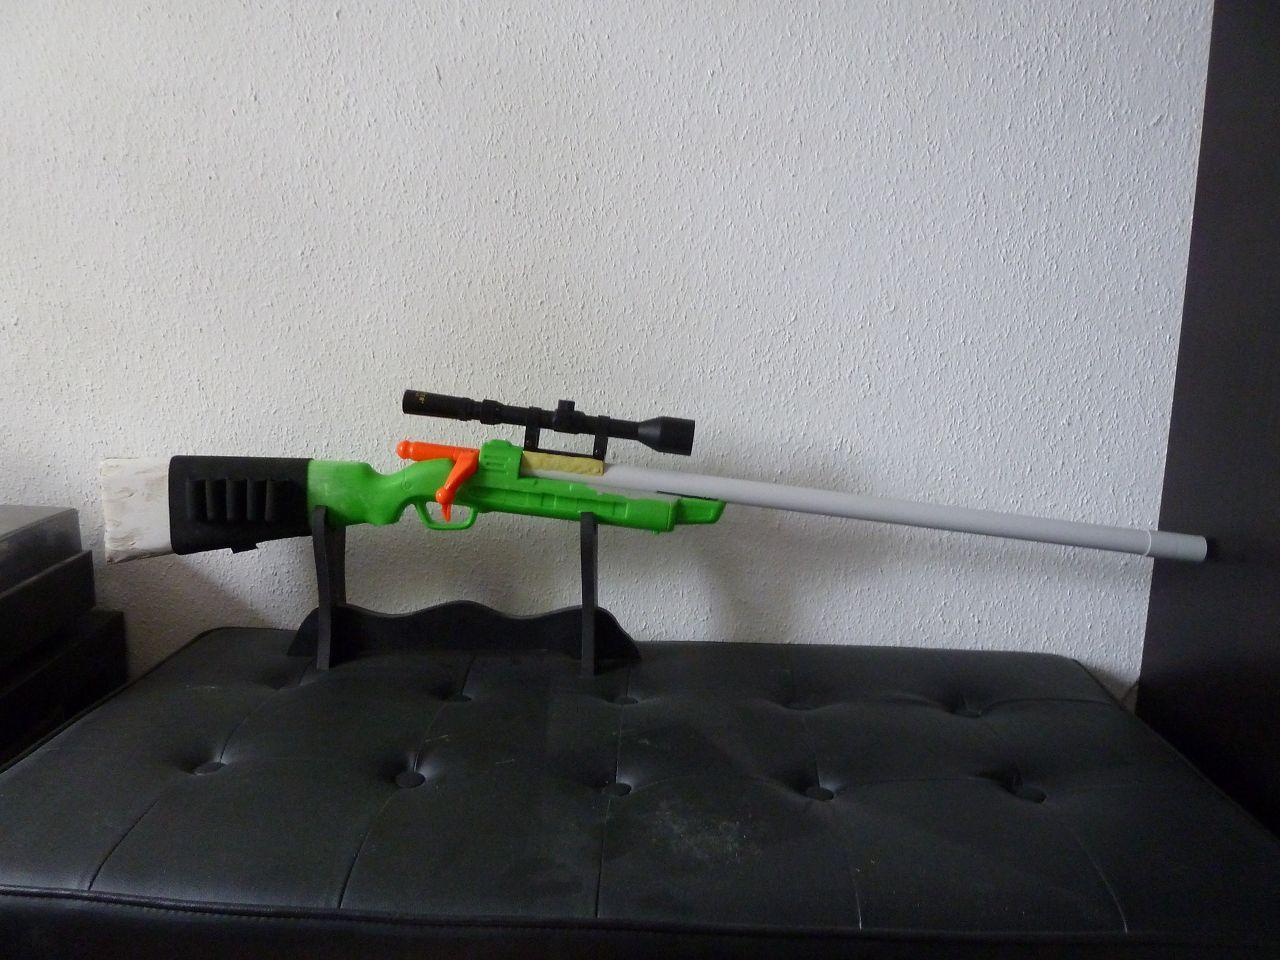 Pin On Guns Riffles And Tactical Gear